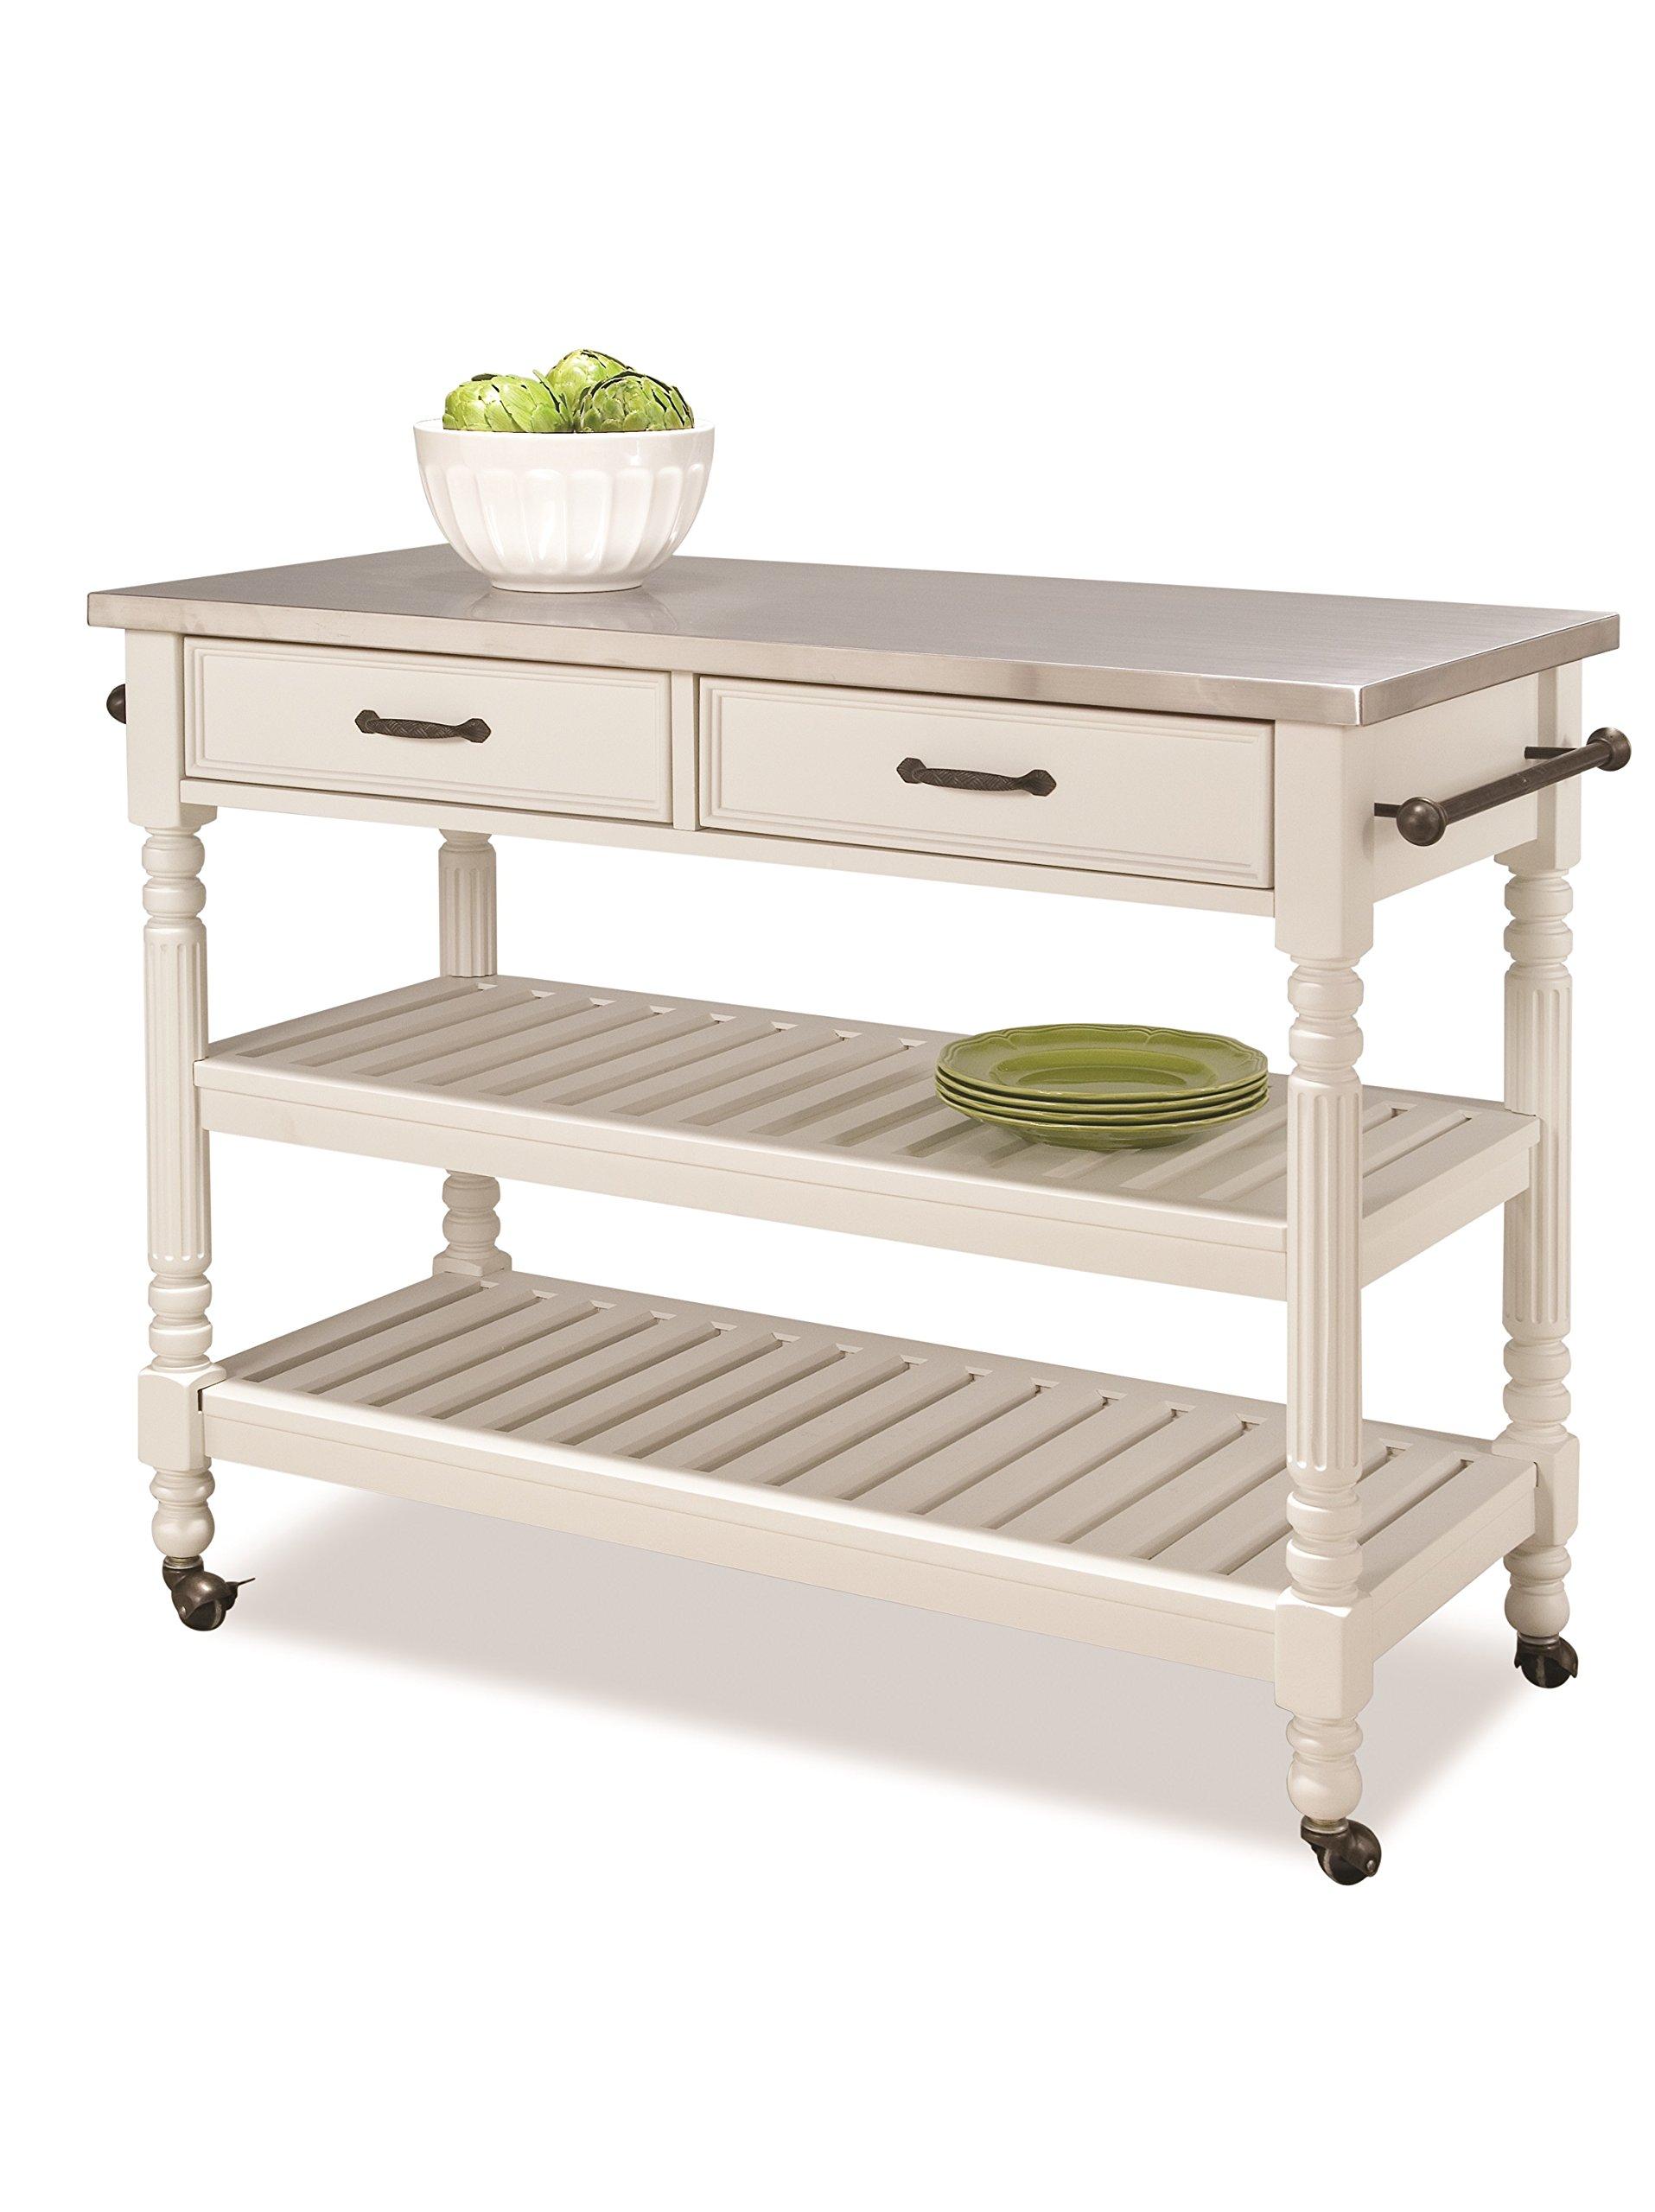 Home Styles Savanna Kitchen Cart, White Finish